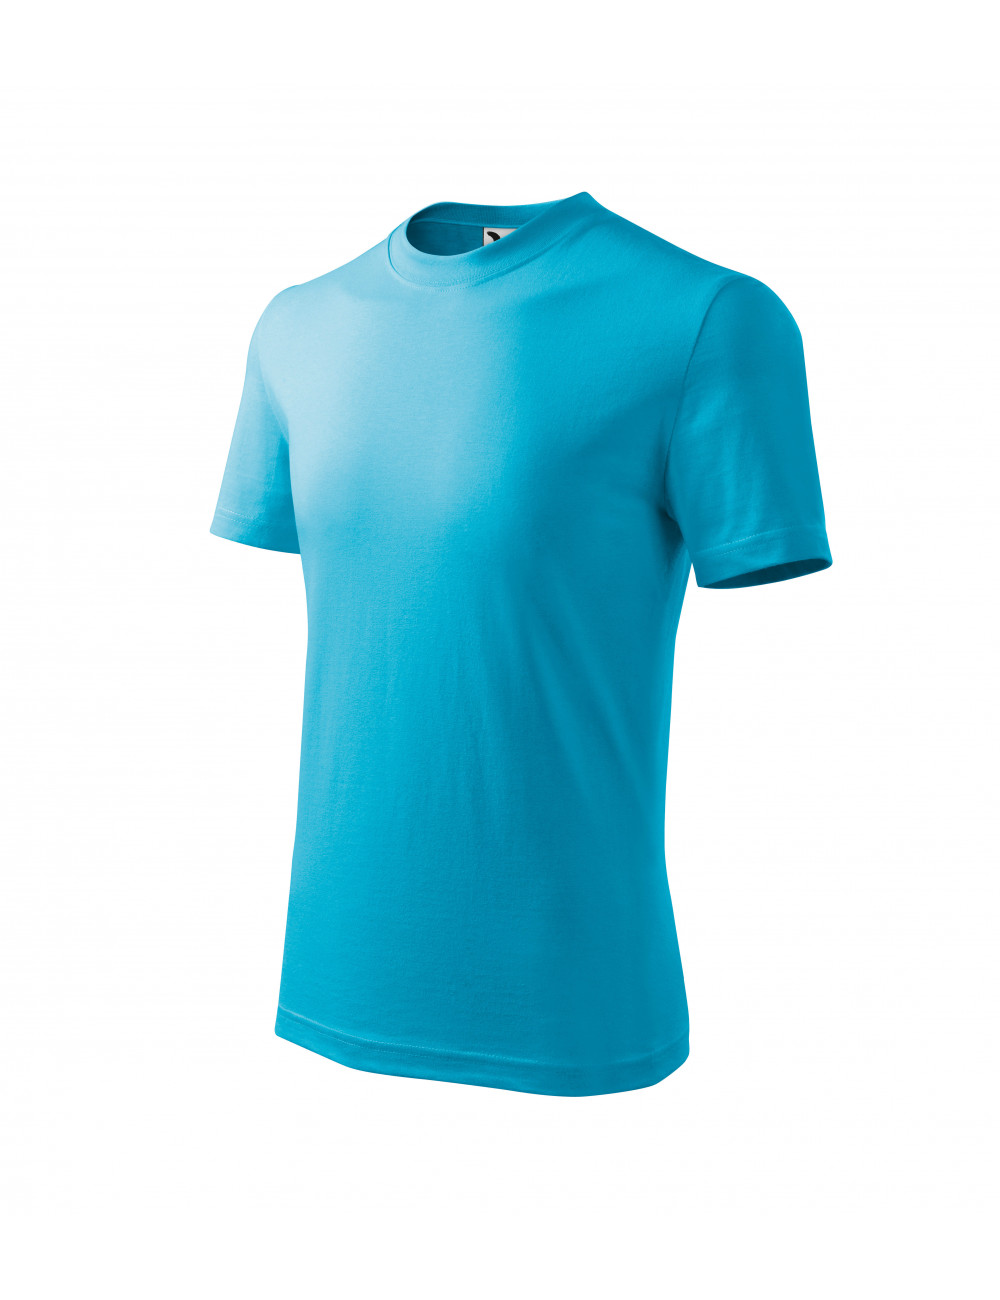 Adler MALFINI Koszulka dziecięca Basic 138 turkus